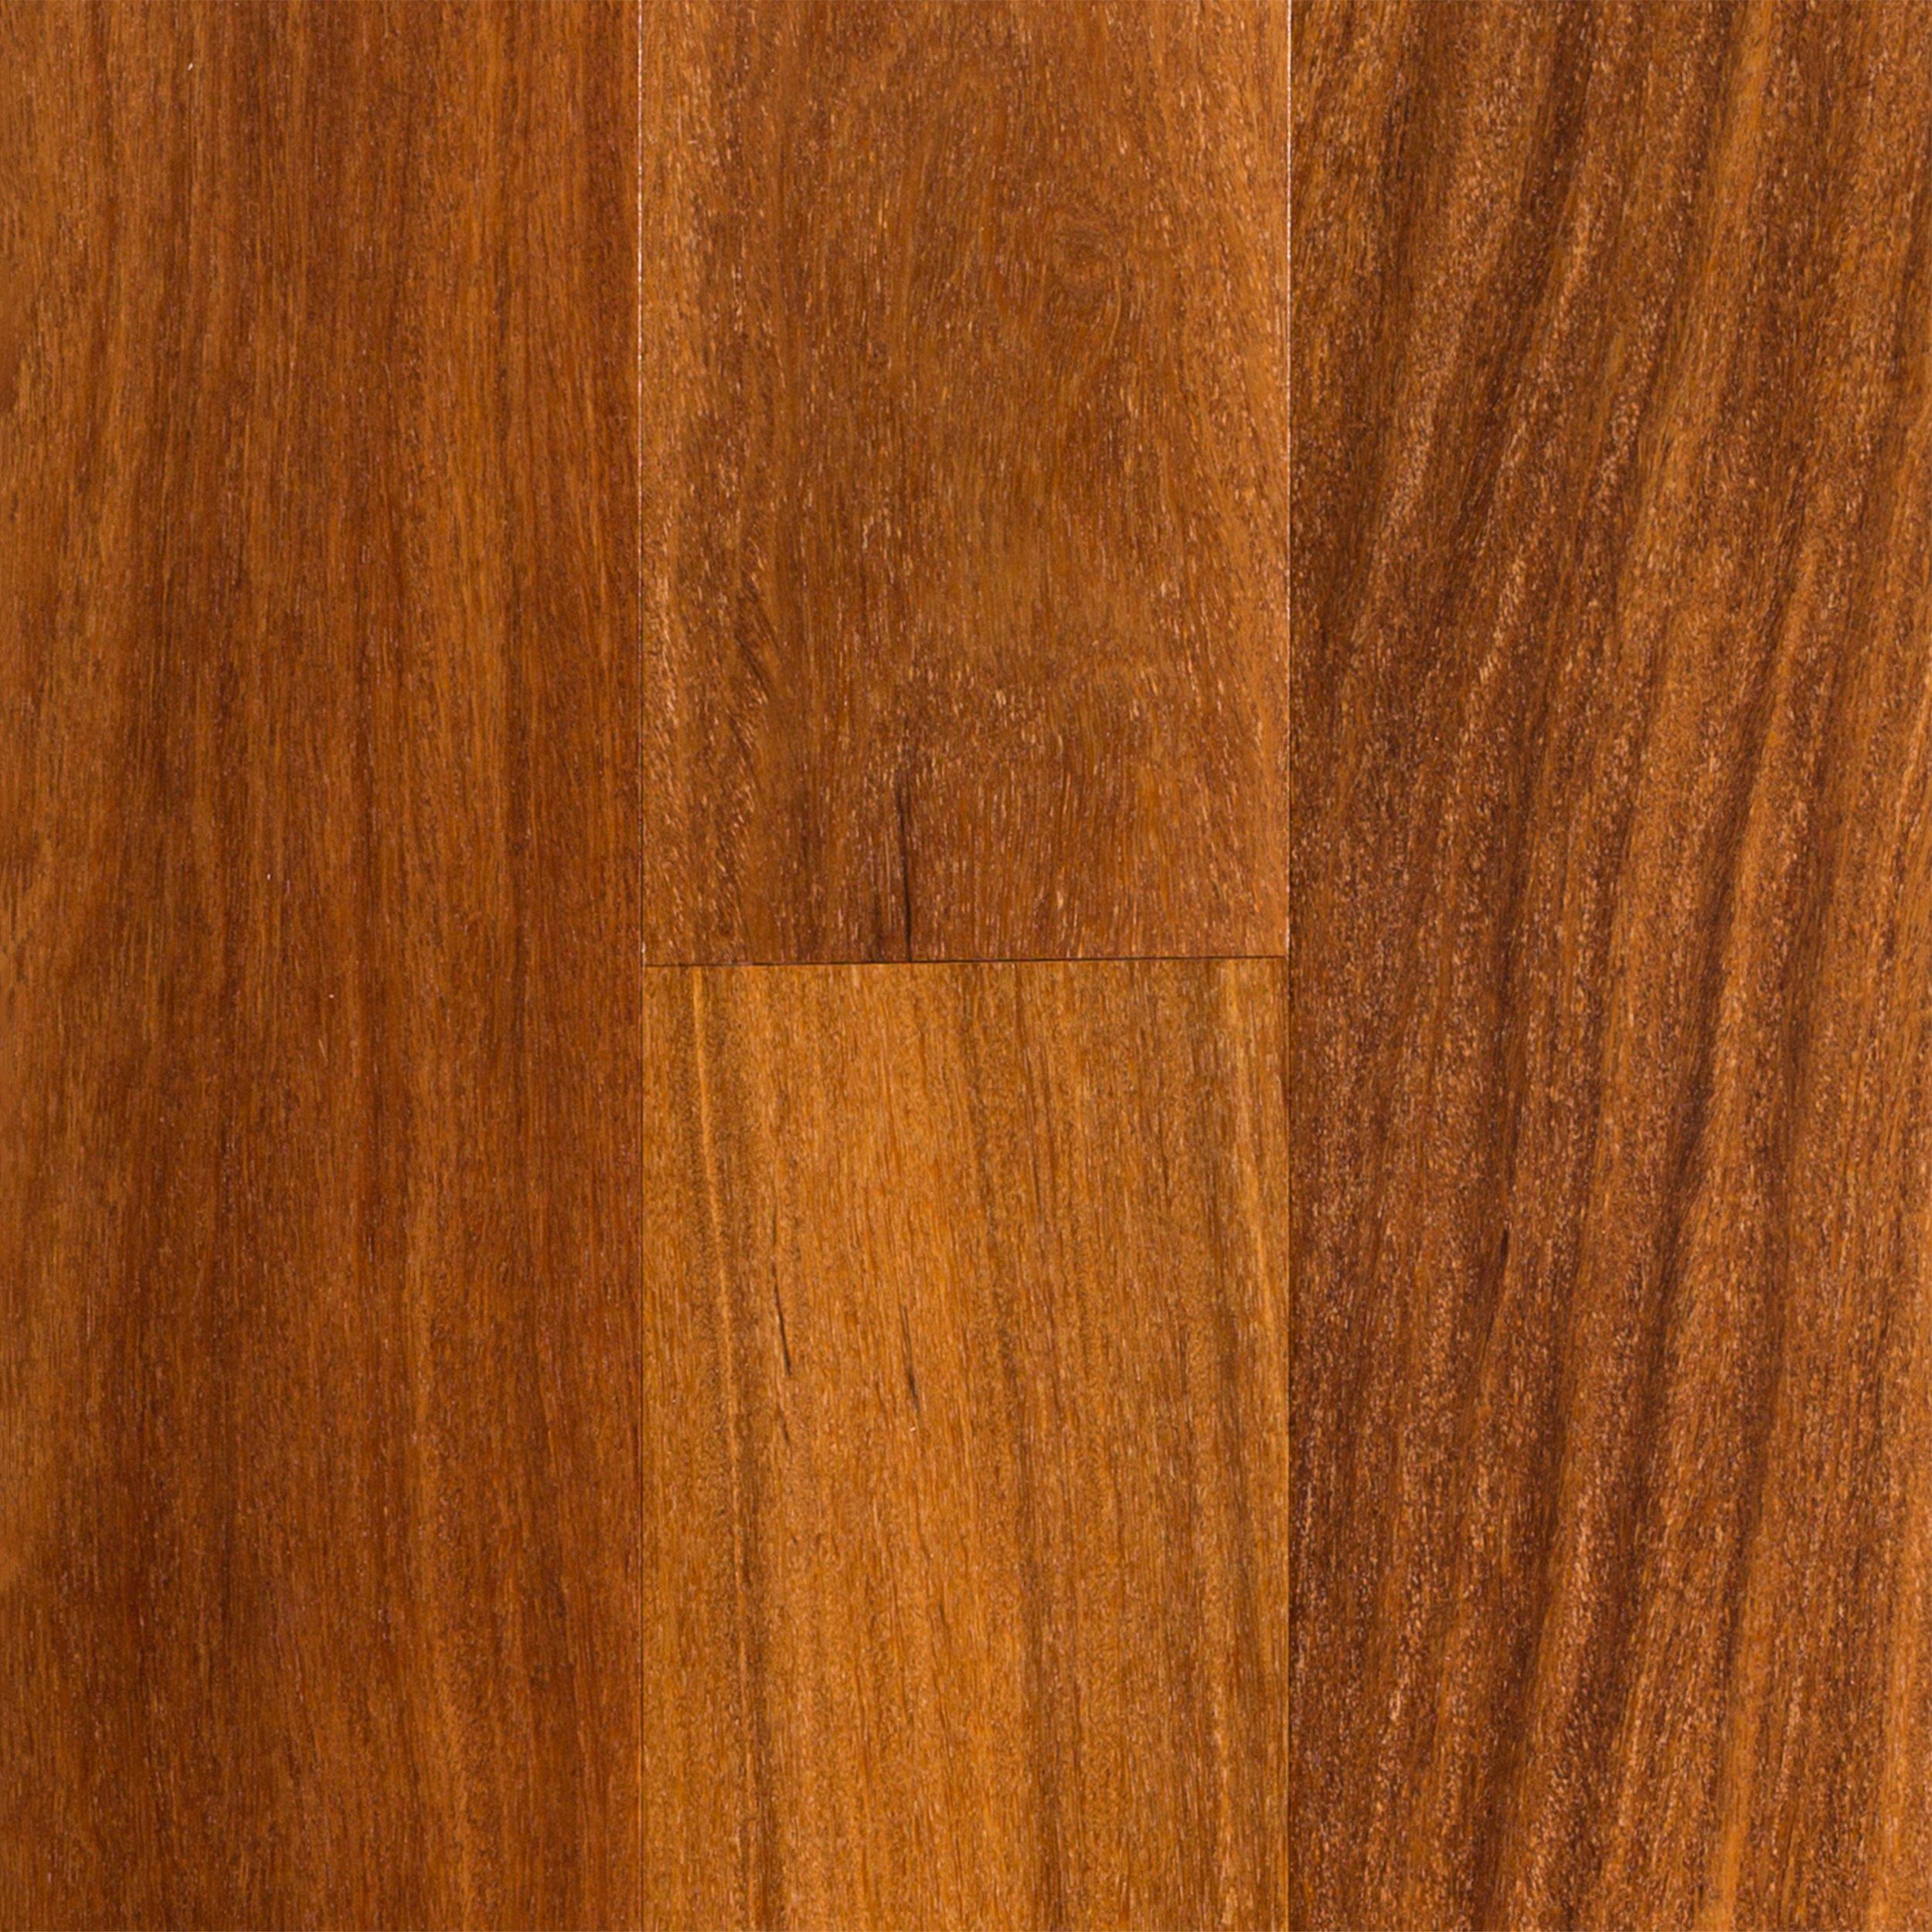 Brazilian Teak Smooth Engineered Hardwood 12in x 5in